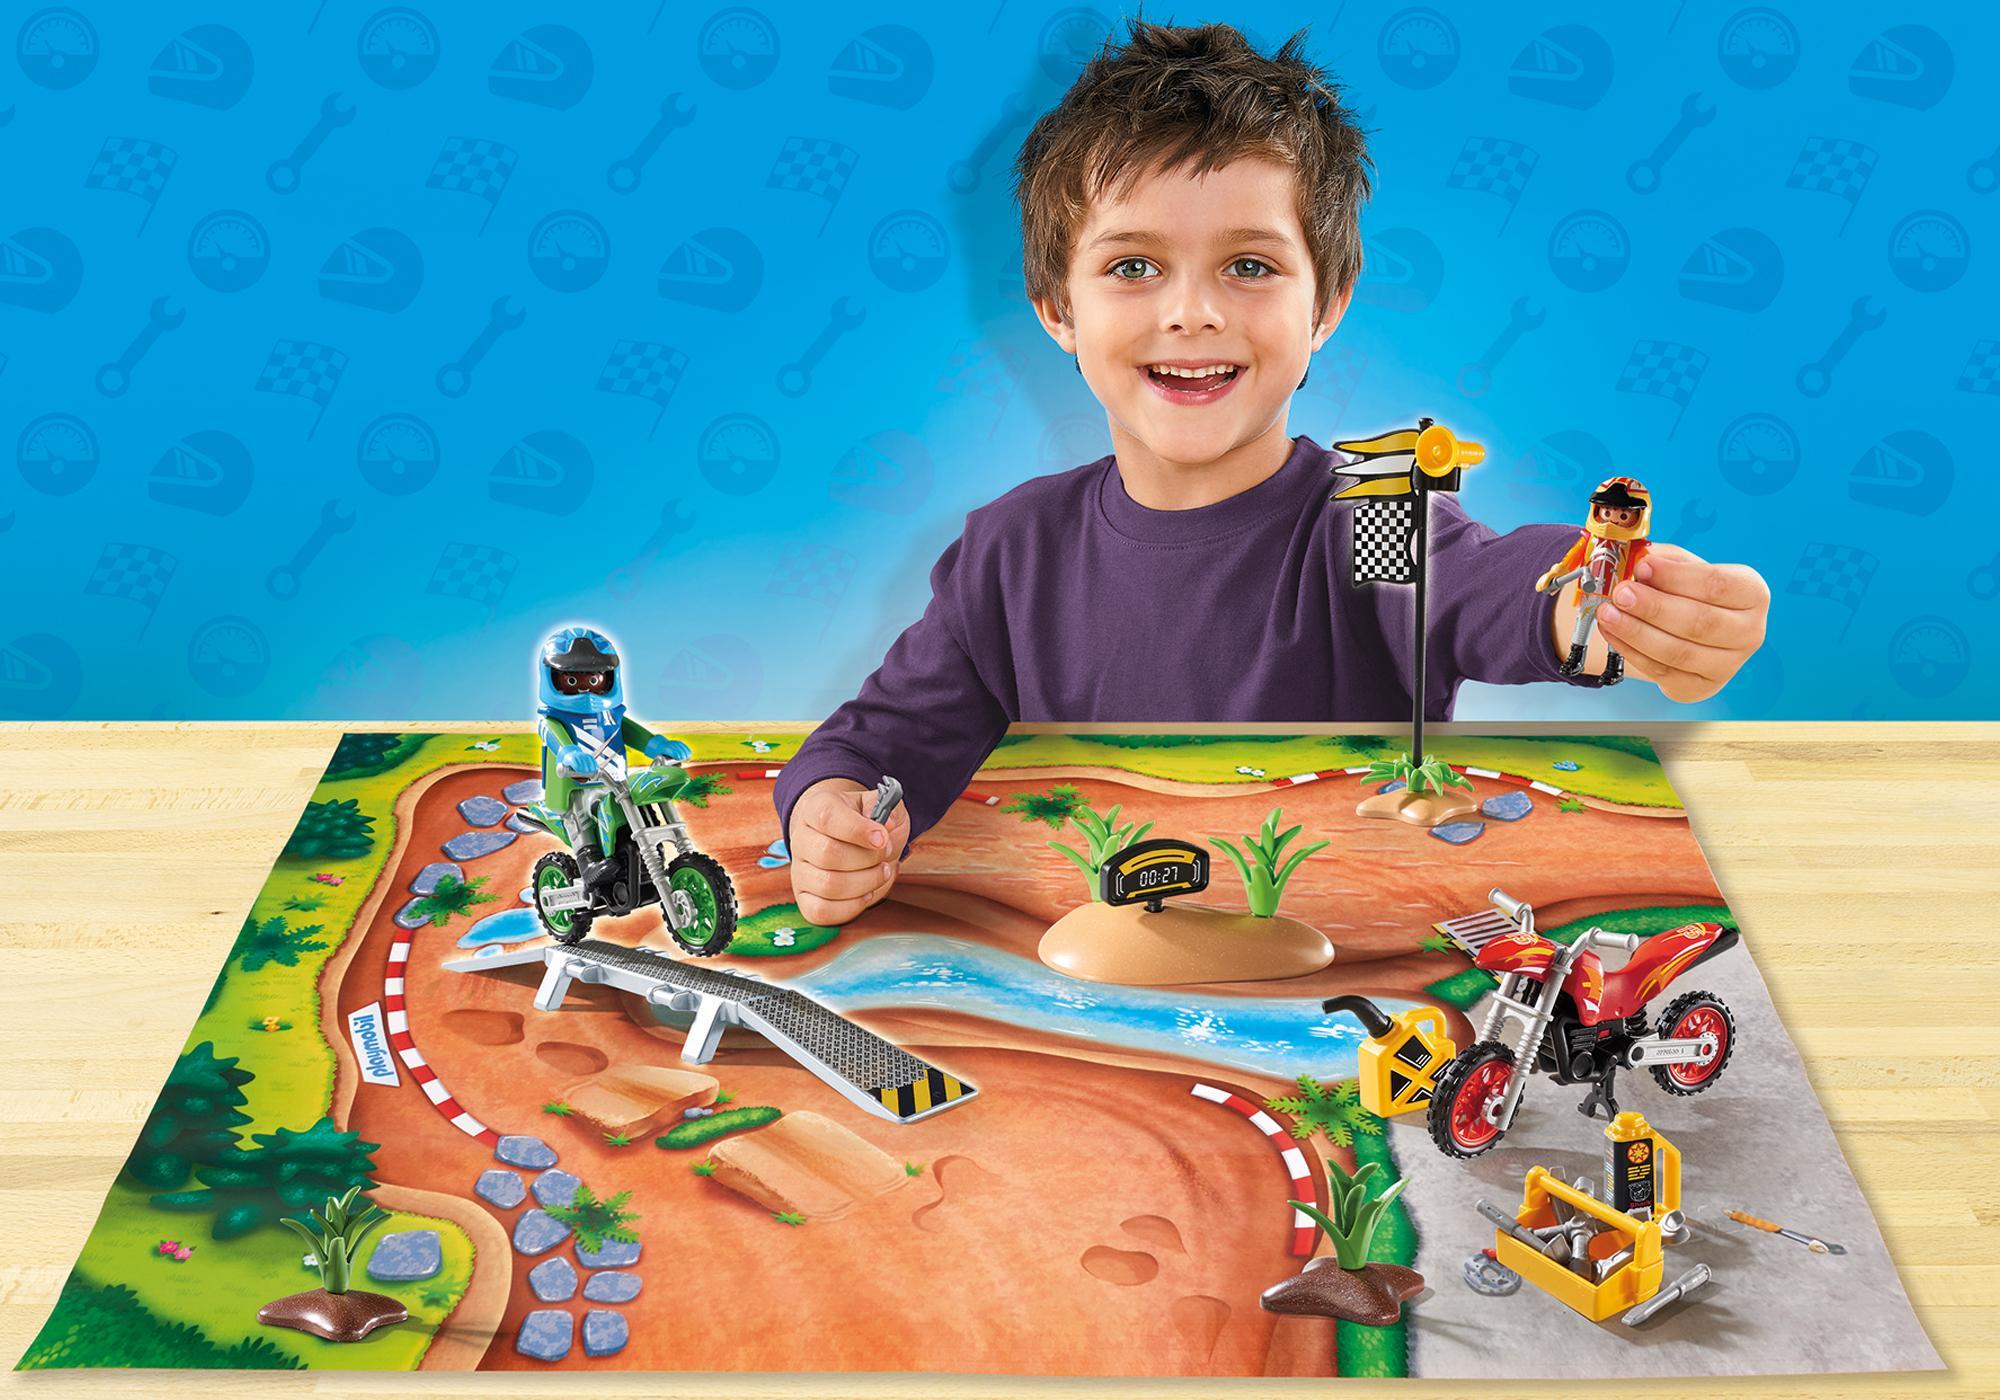 http://media.playmobil.com/i/playmobil/9329_product_detail/Mapa de Jogo Motocross